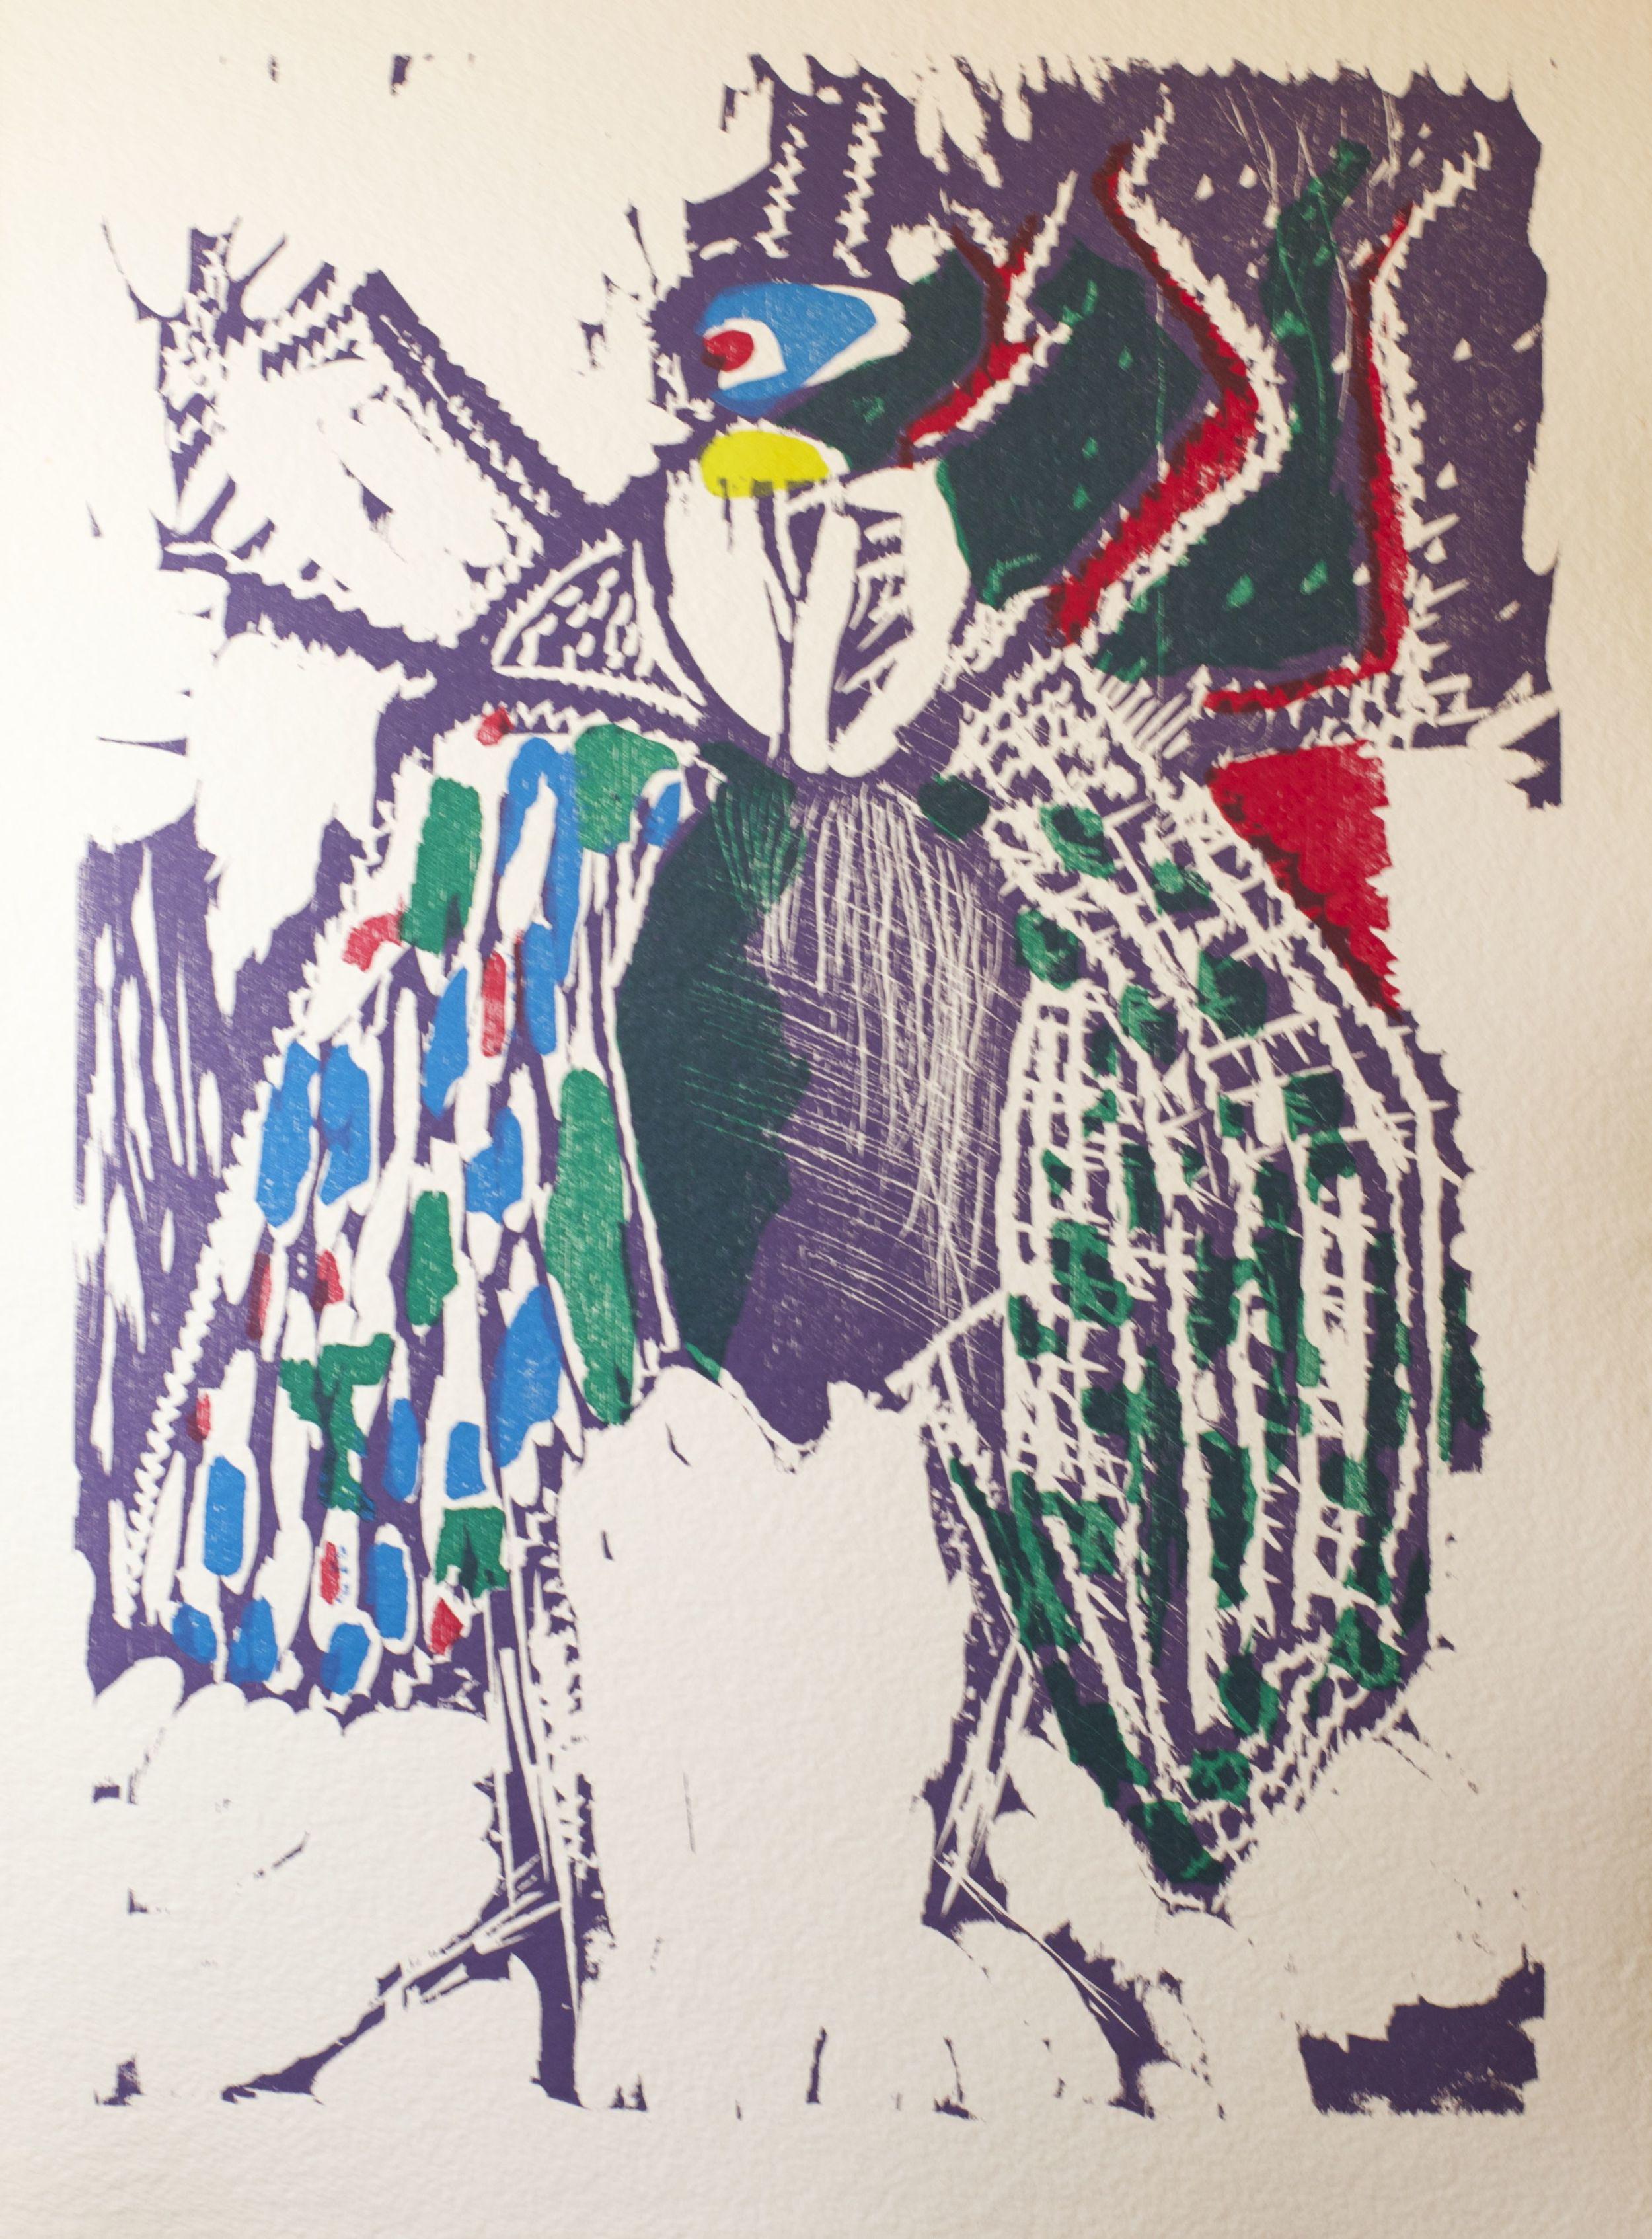 The Fly (La Mouche)